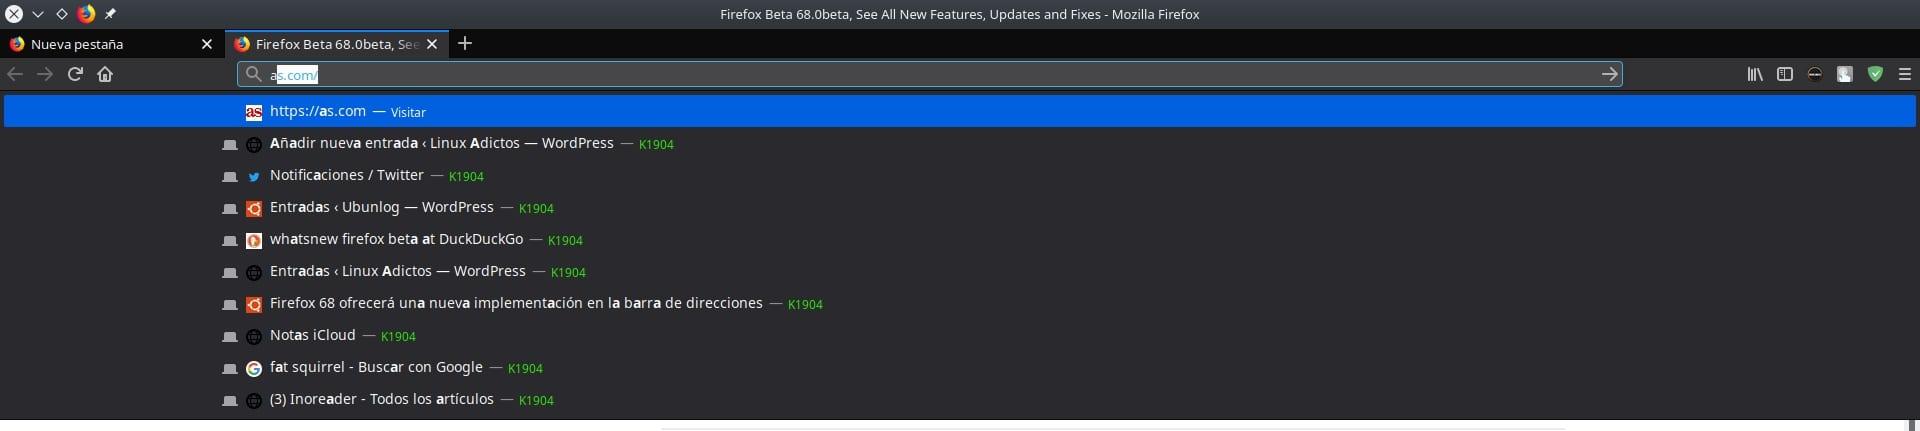 Firefox beta 68